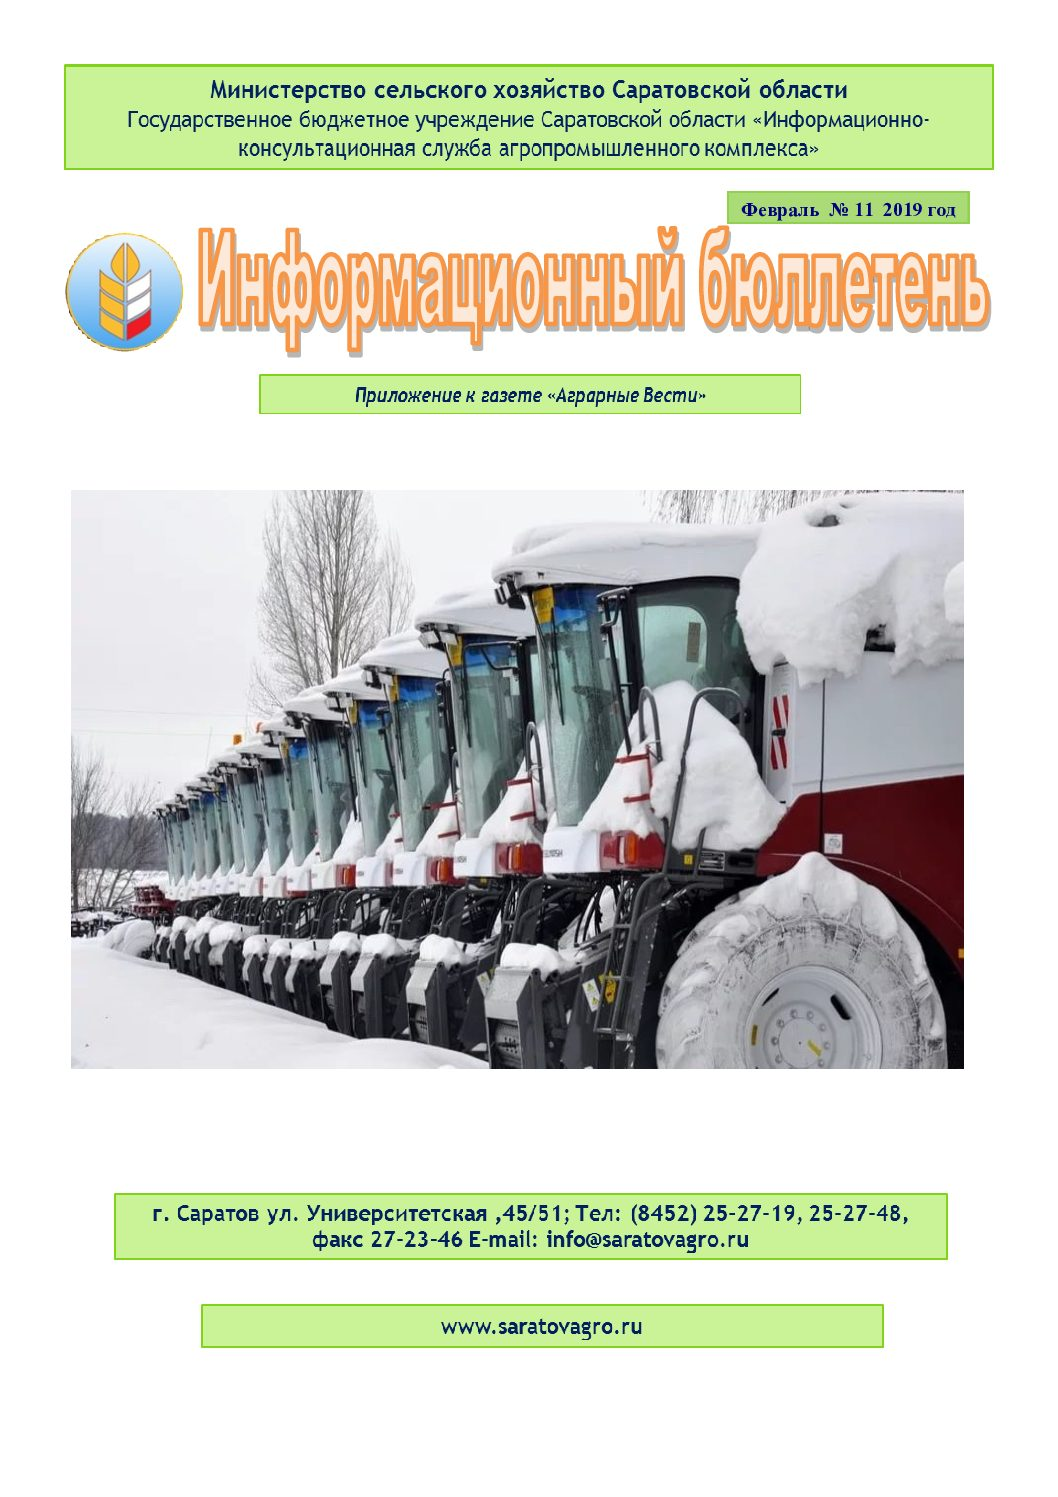 https://saratovagro.ru/wp-content/uploads/2020/08/11.2019-pdf.jpg